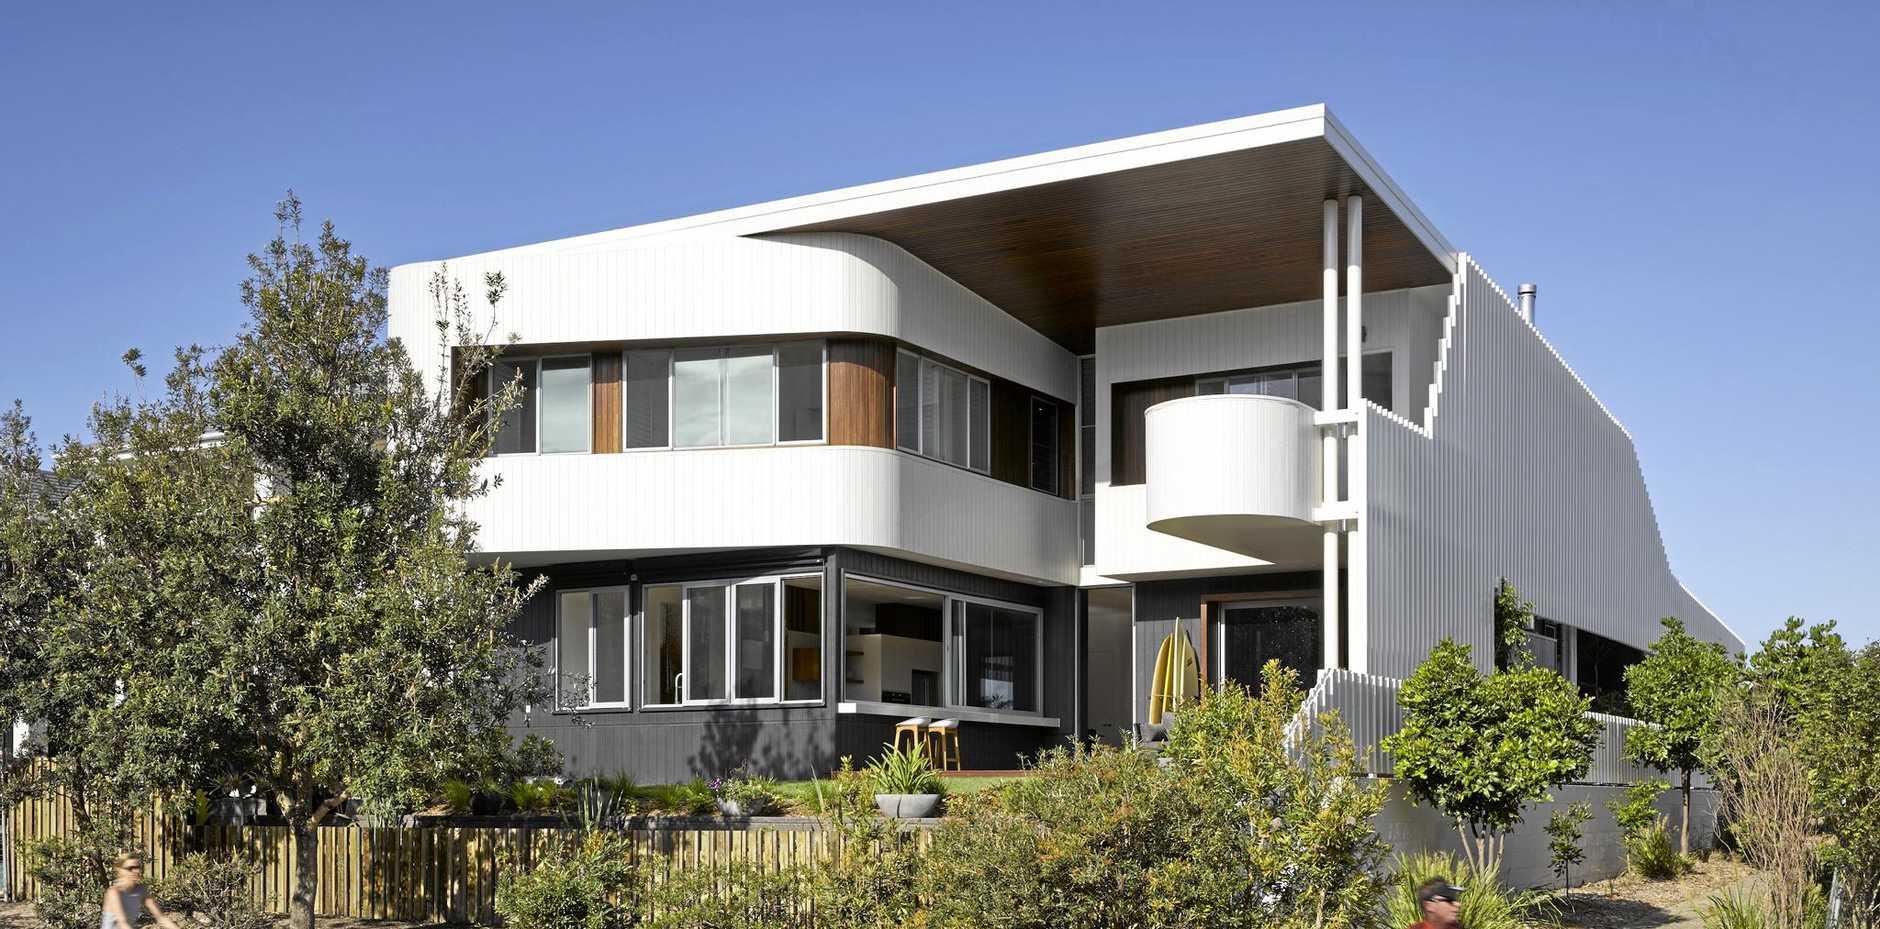 Whale House by Paul Uhlmann Architects, Kingscliff